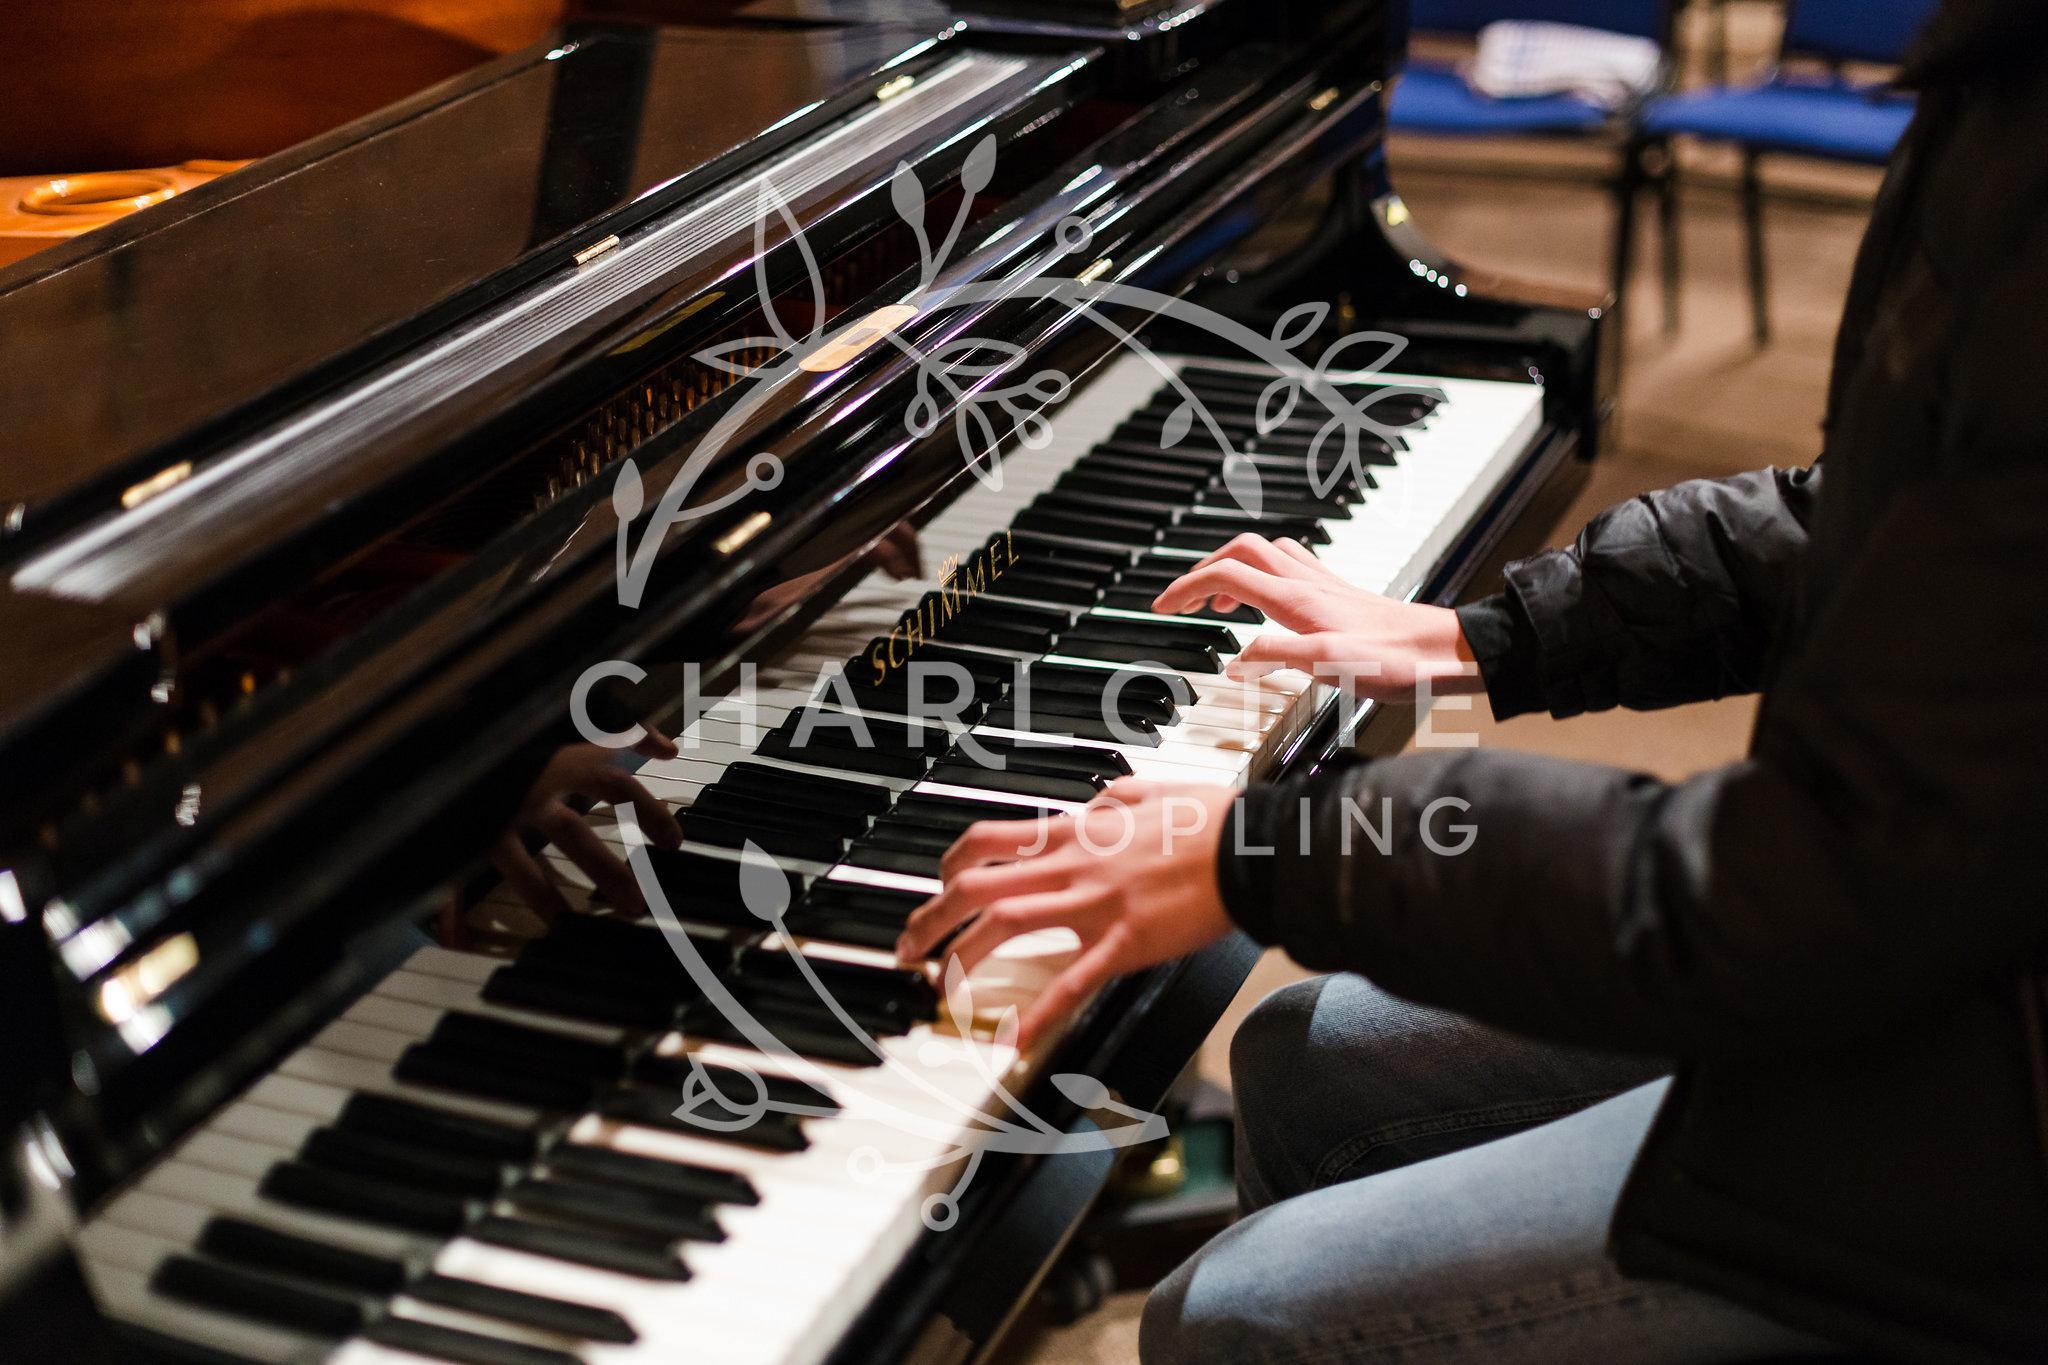 Stepping-Stones-Voicebox-Concert-2018-by-Charlotte-Jopling-113.jpg